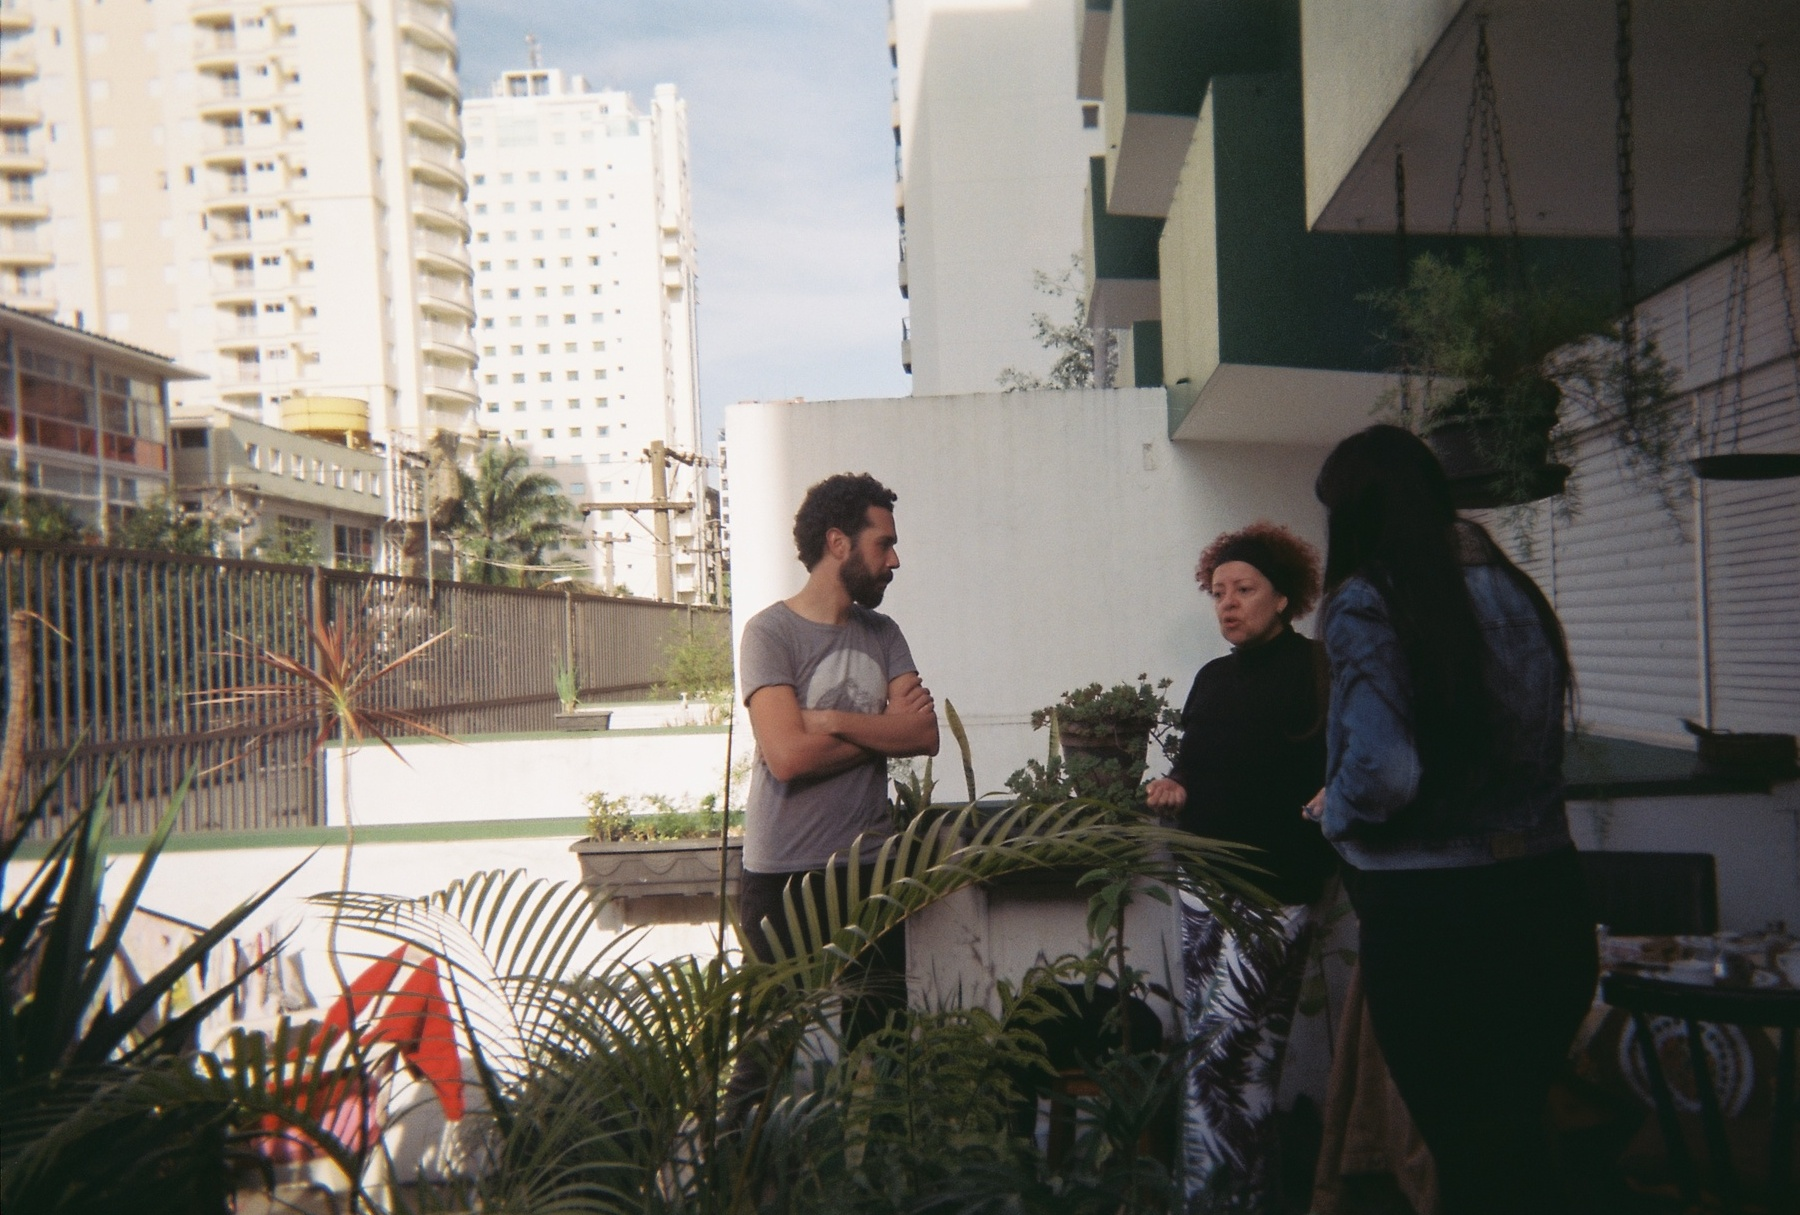 Coffee on the veranda (São Paulo) -- L-R Marcelo Florentino, Saundra Coutinho, Luiza Demoro